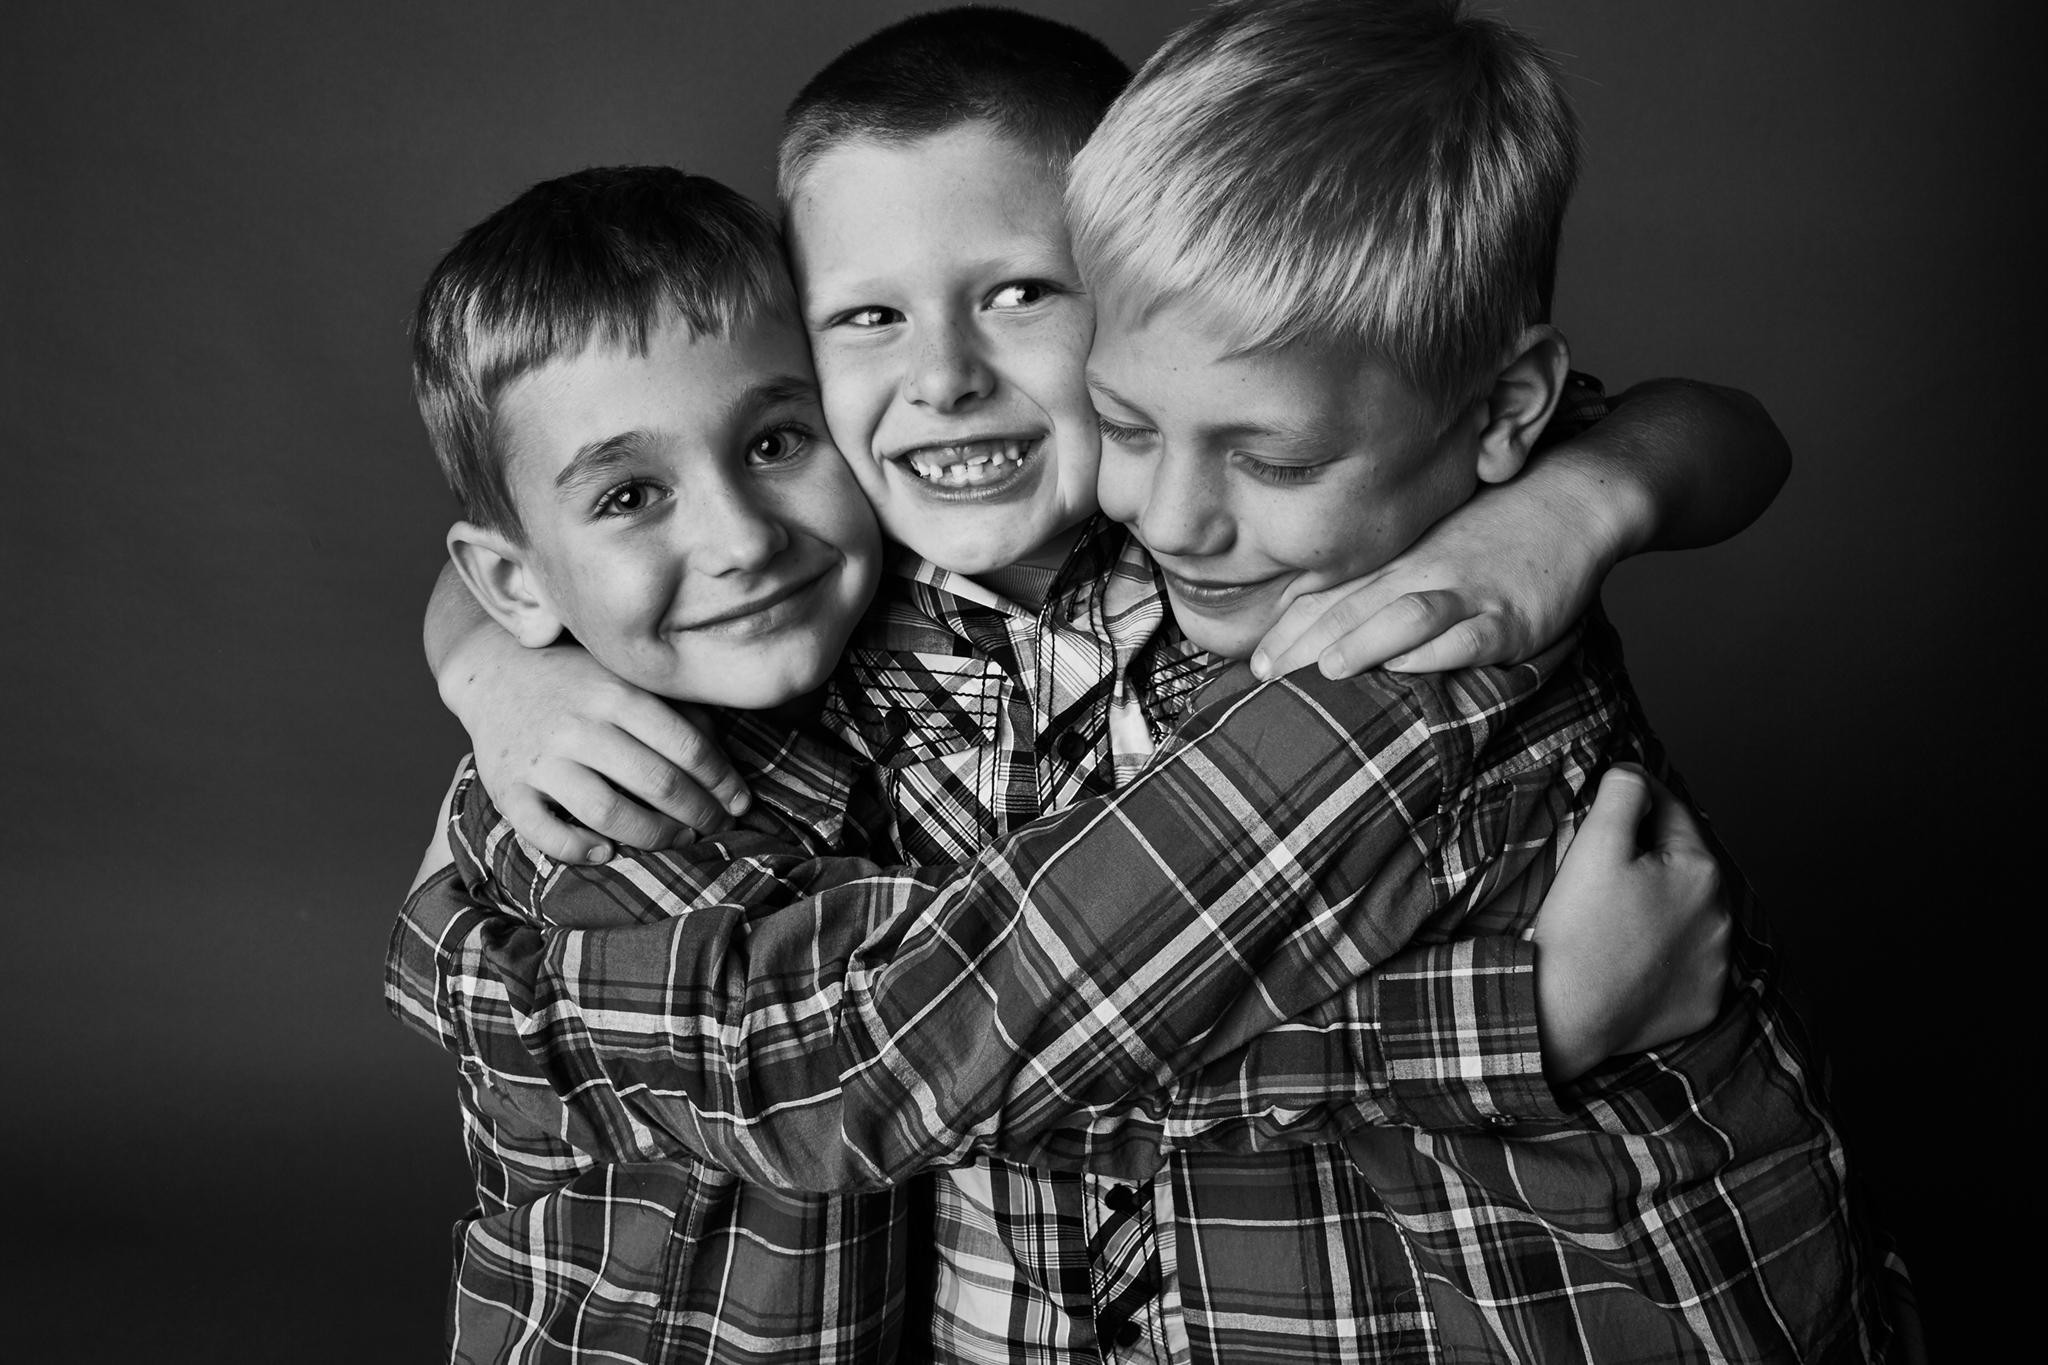 Kids_Portrait_Commercial_Fashion_Shoot_Minneapolis_Photographer_Joe_Lemke_002.JPG